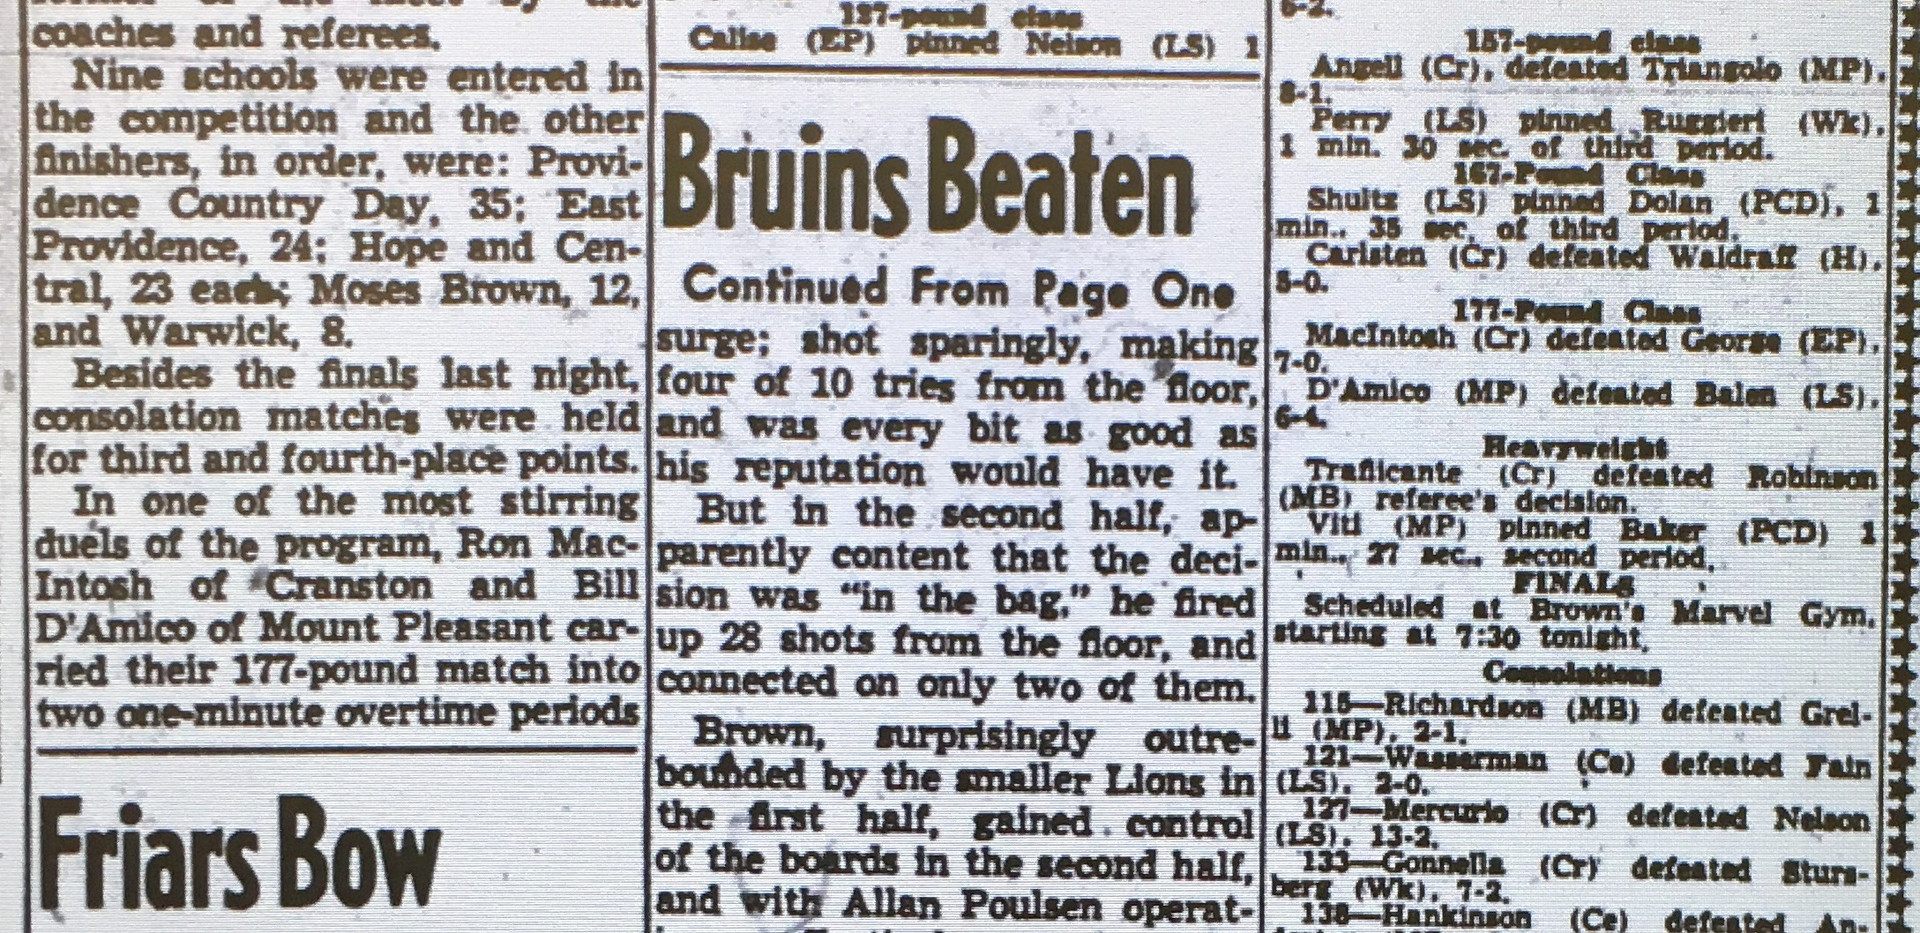 1957 State Tournament